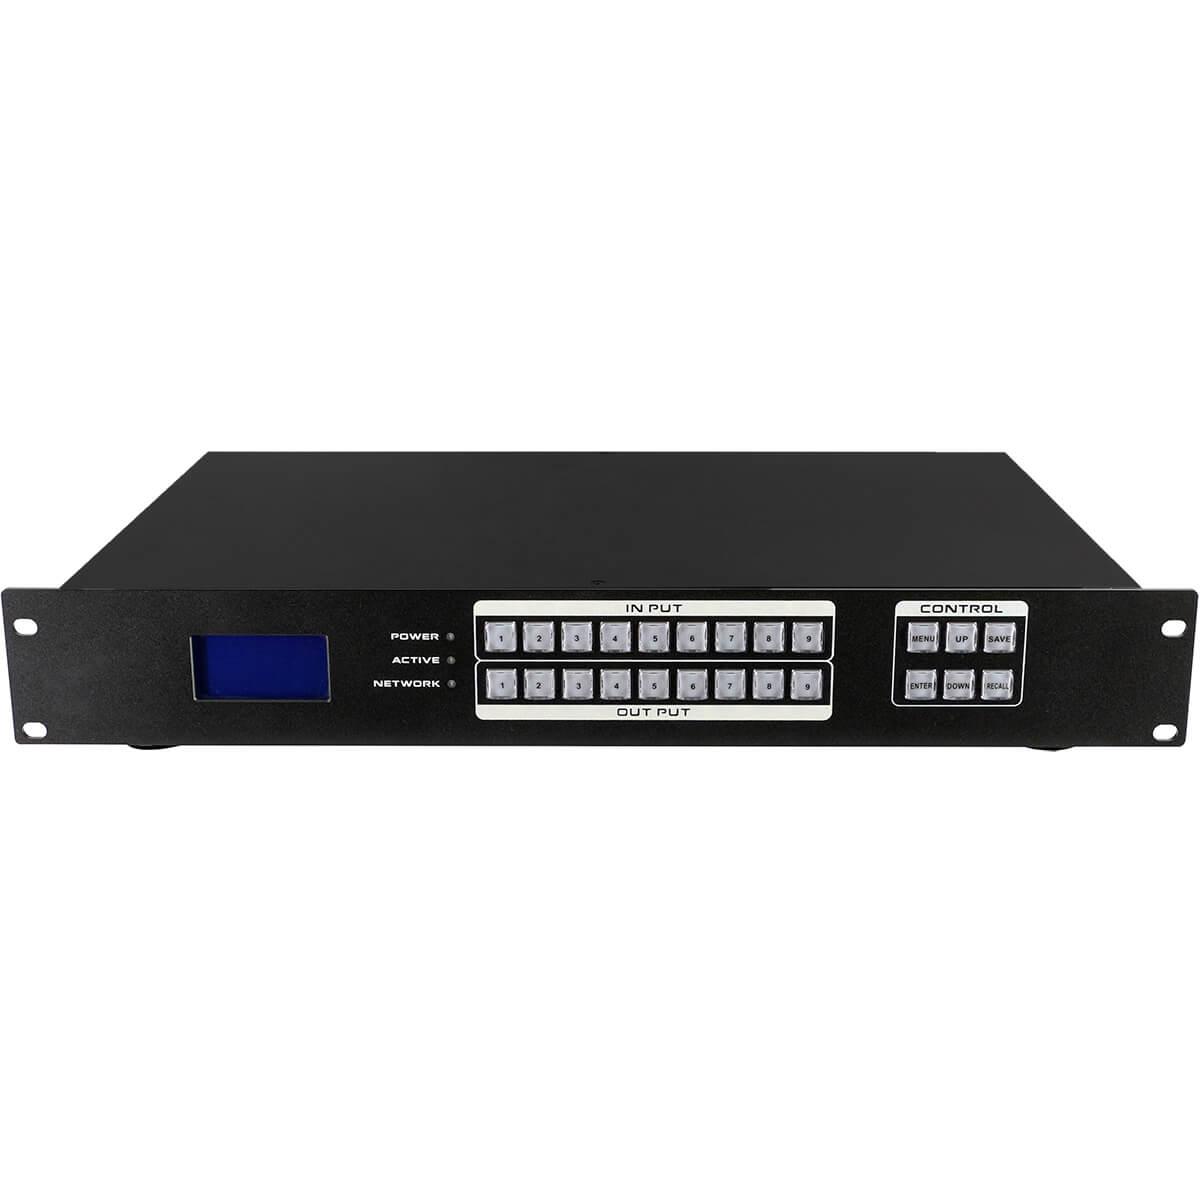 BeingHD Matriz De Video HDMI 9×9 FIX Manager 900 Plus